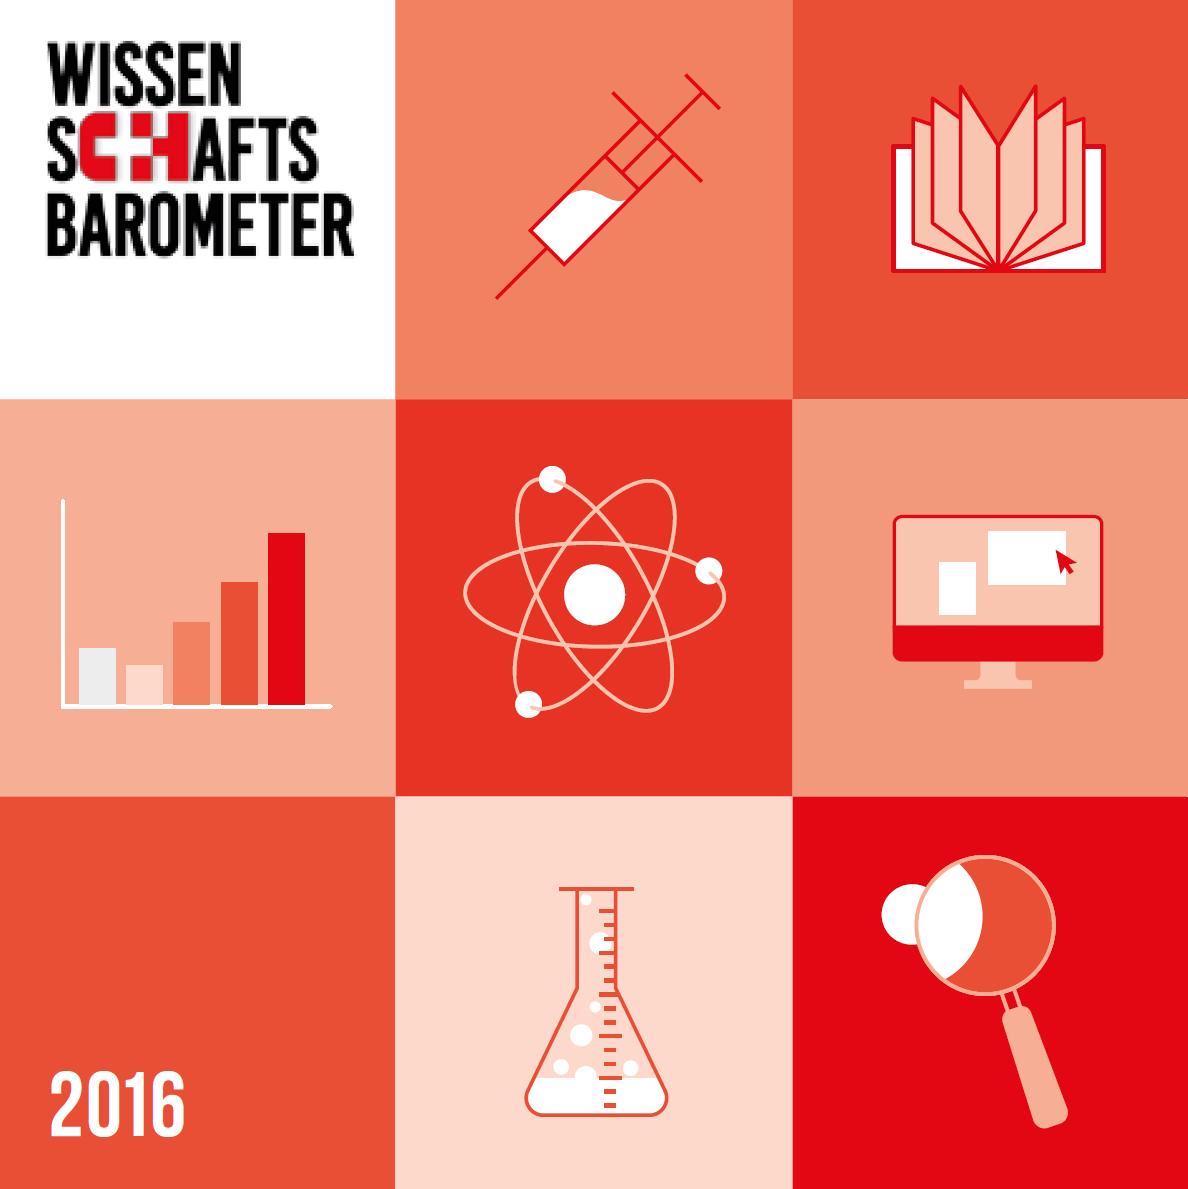 Wissenschaftsbarometer